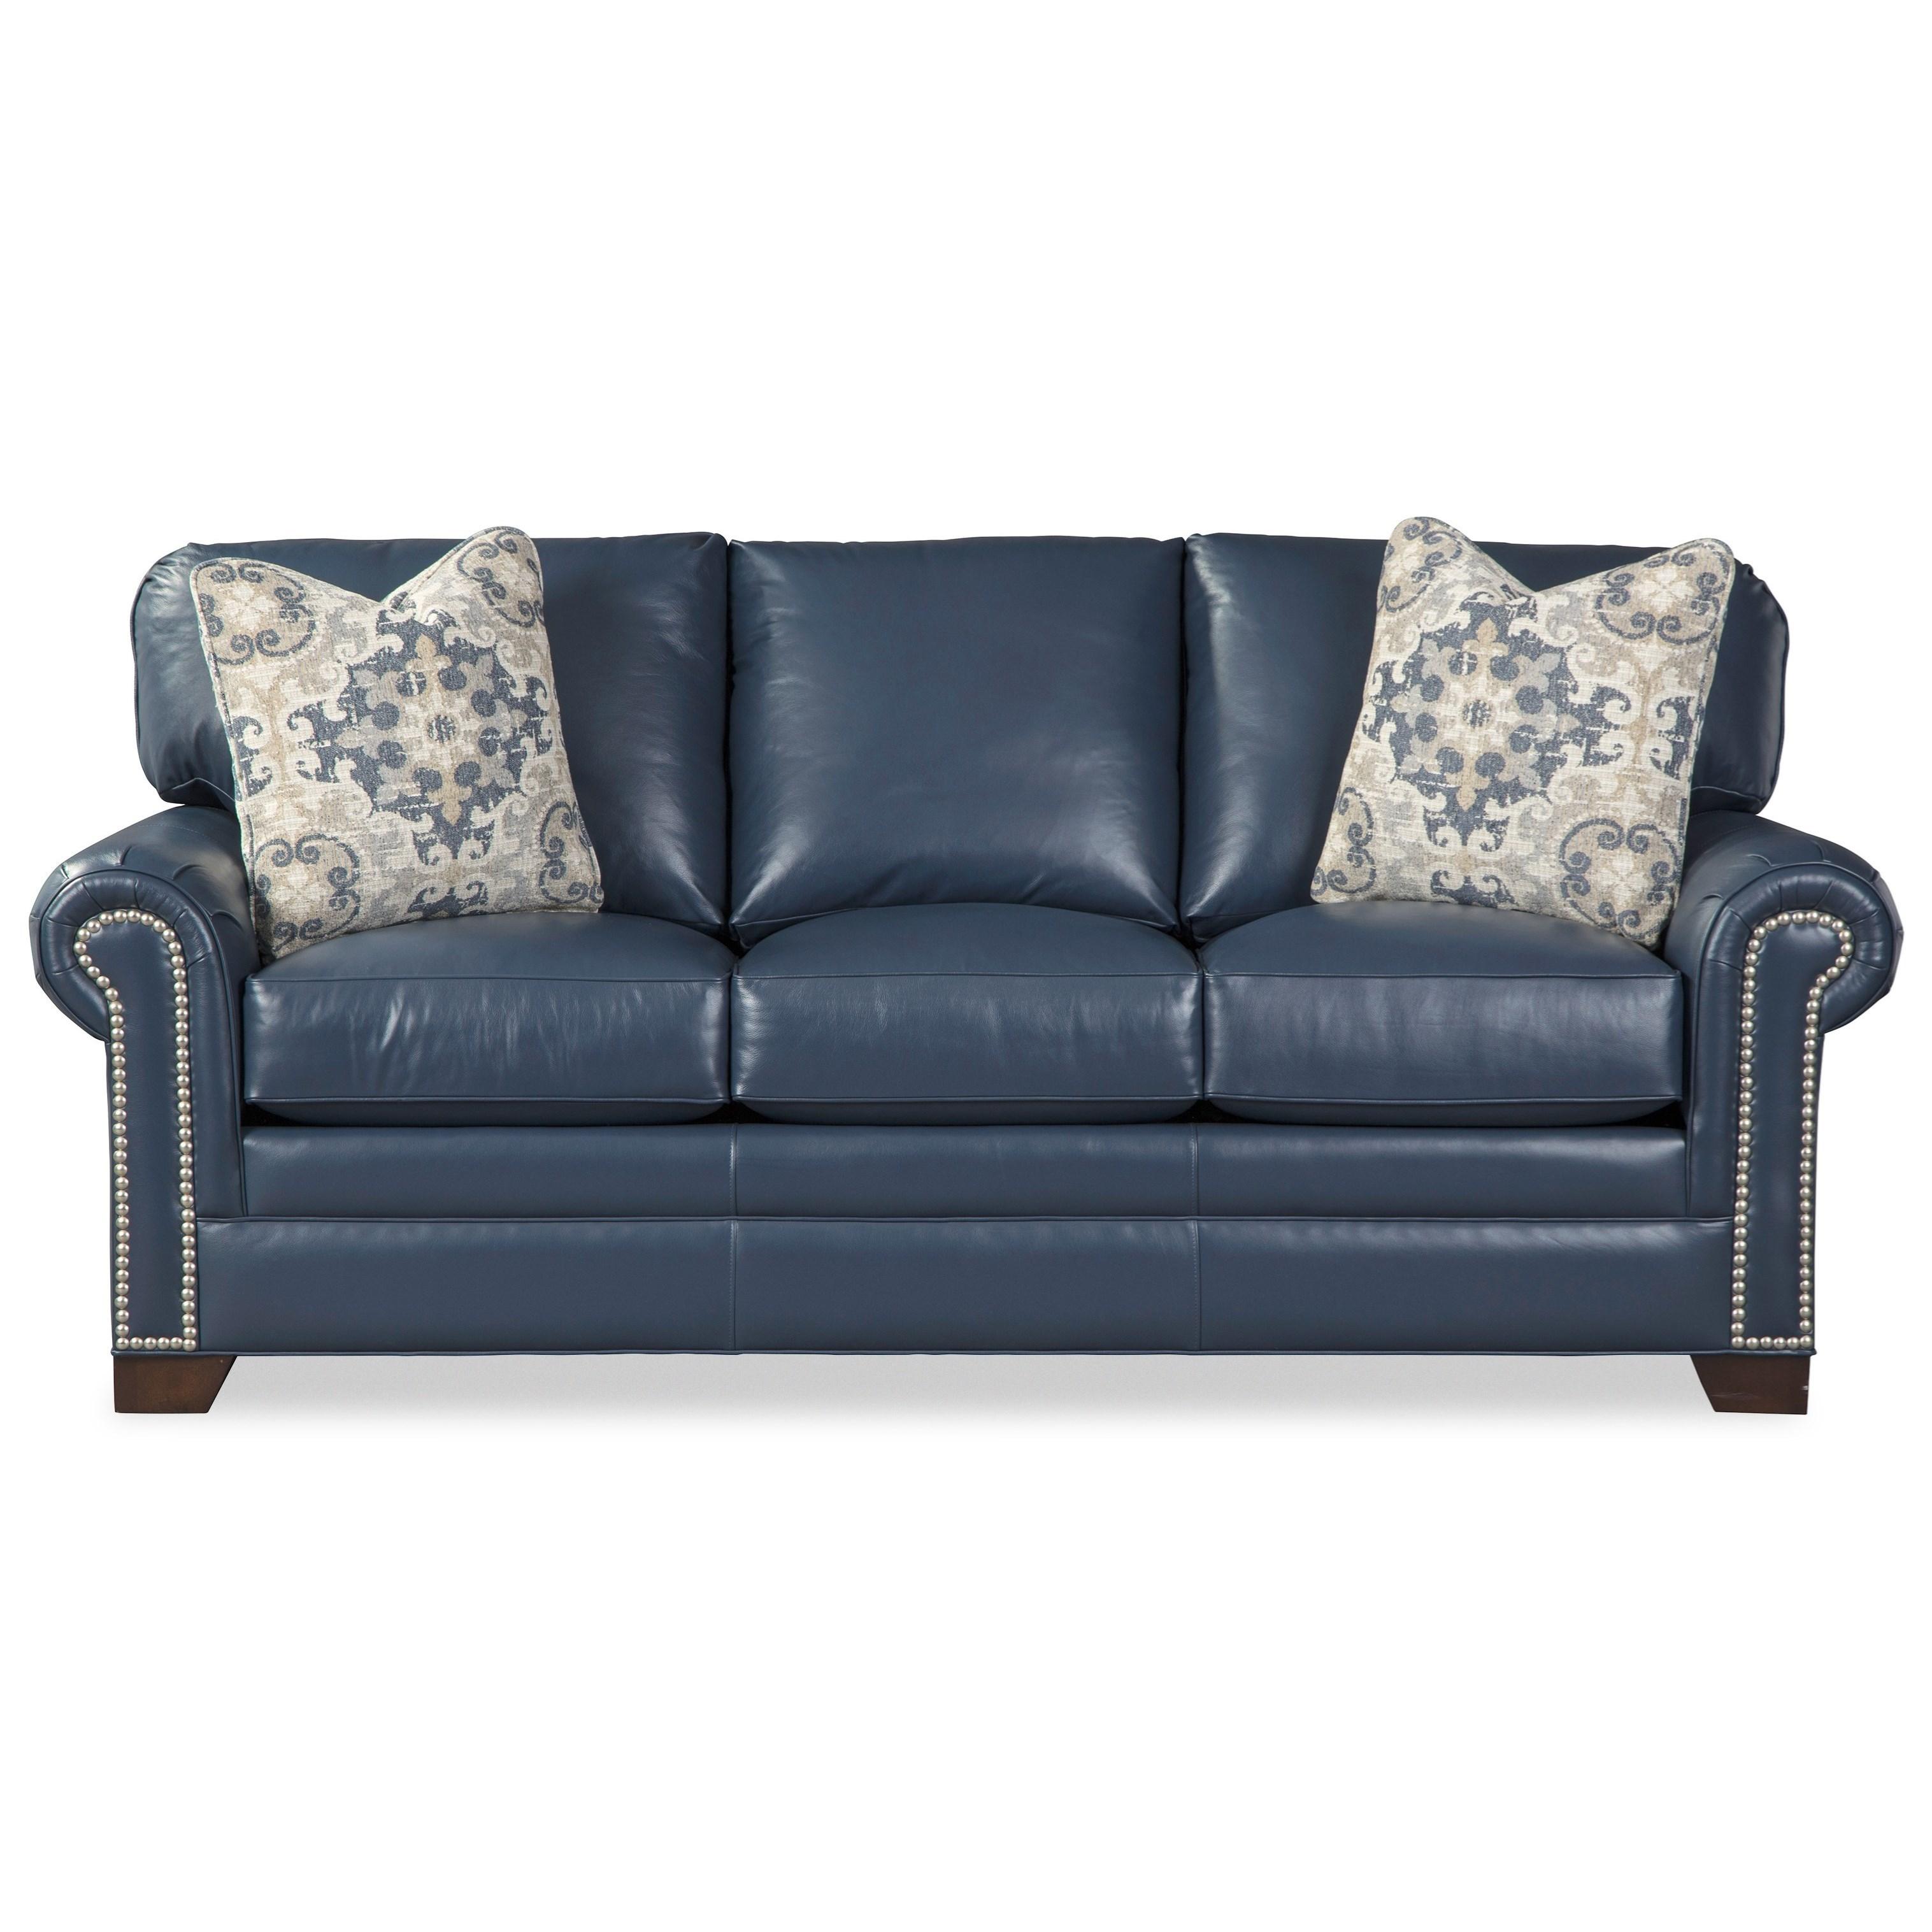 L756550 Sofa w/ Nailheads & Pillows by Craftmaster at Baer's Furniture